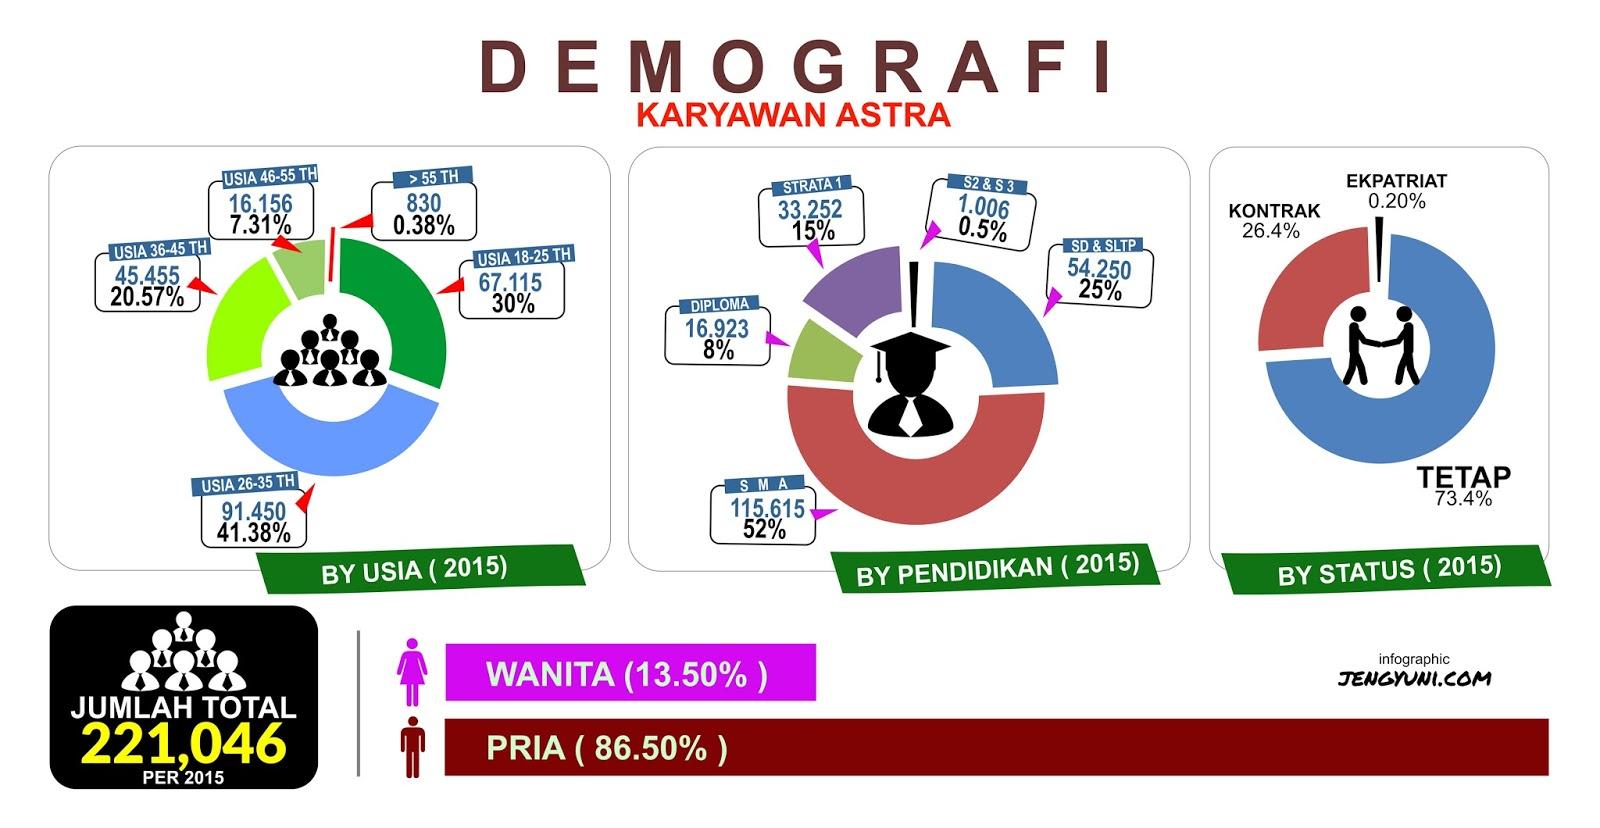 Demografi Karyawan Astra